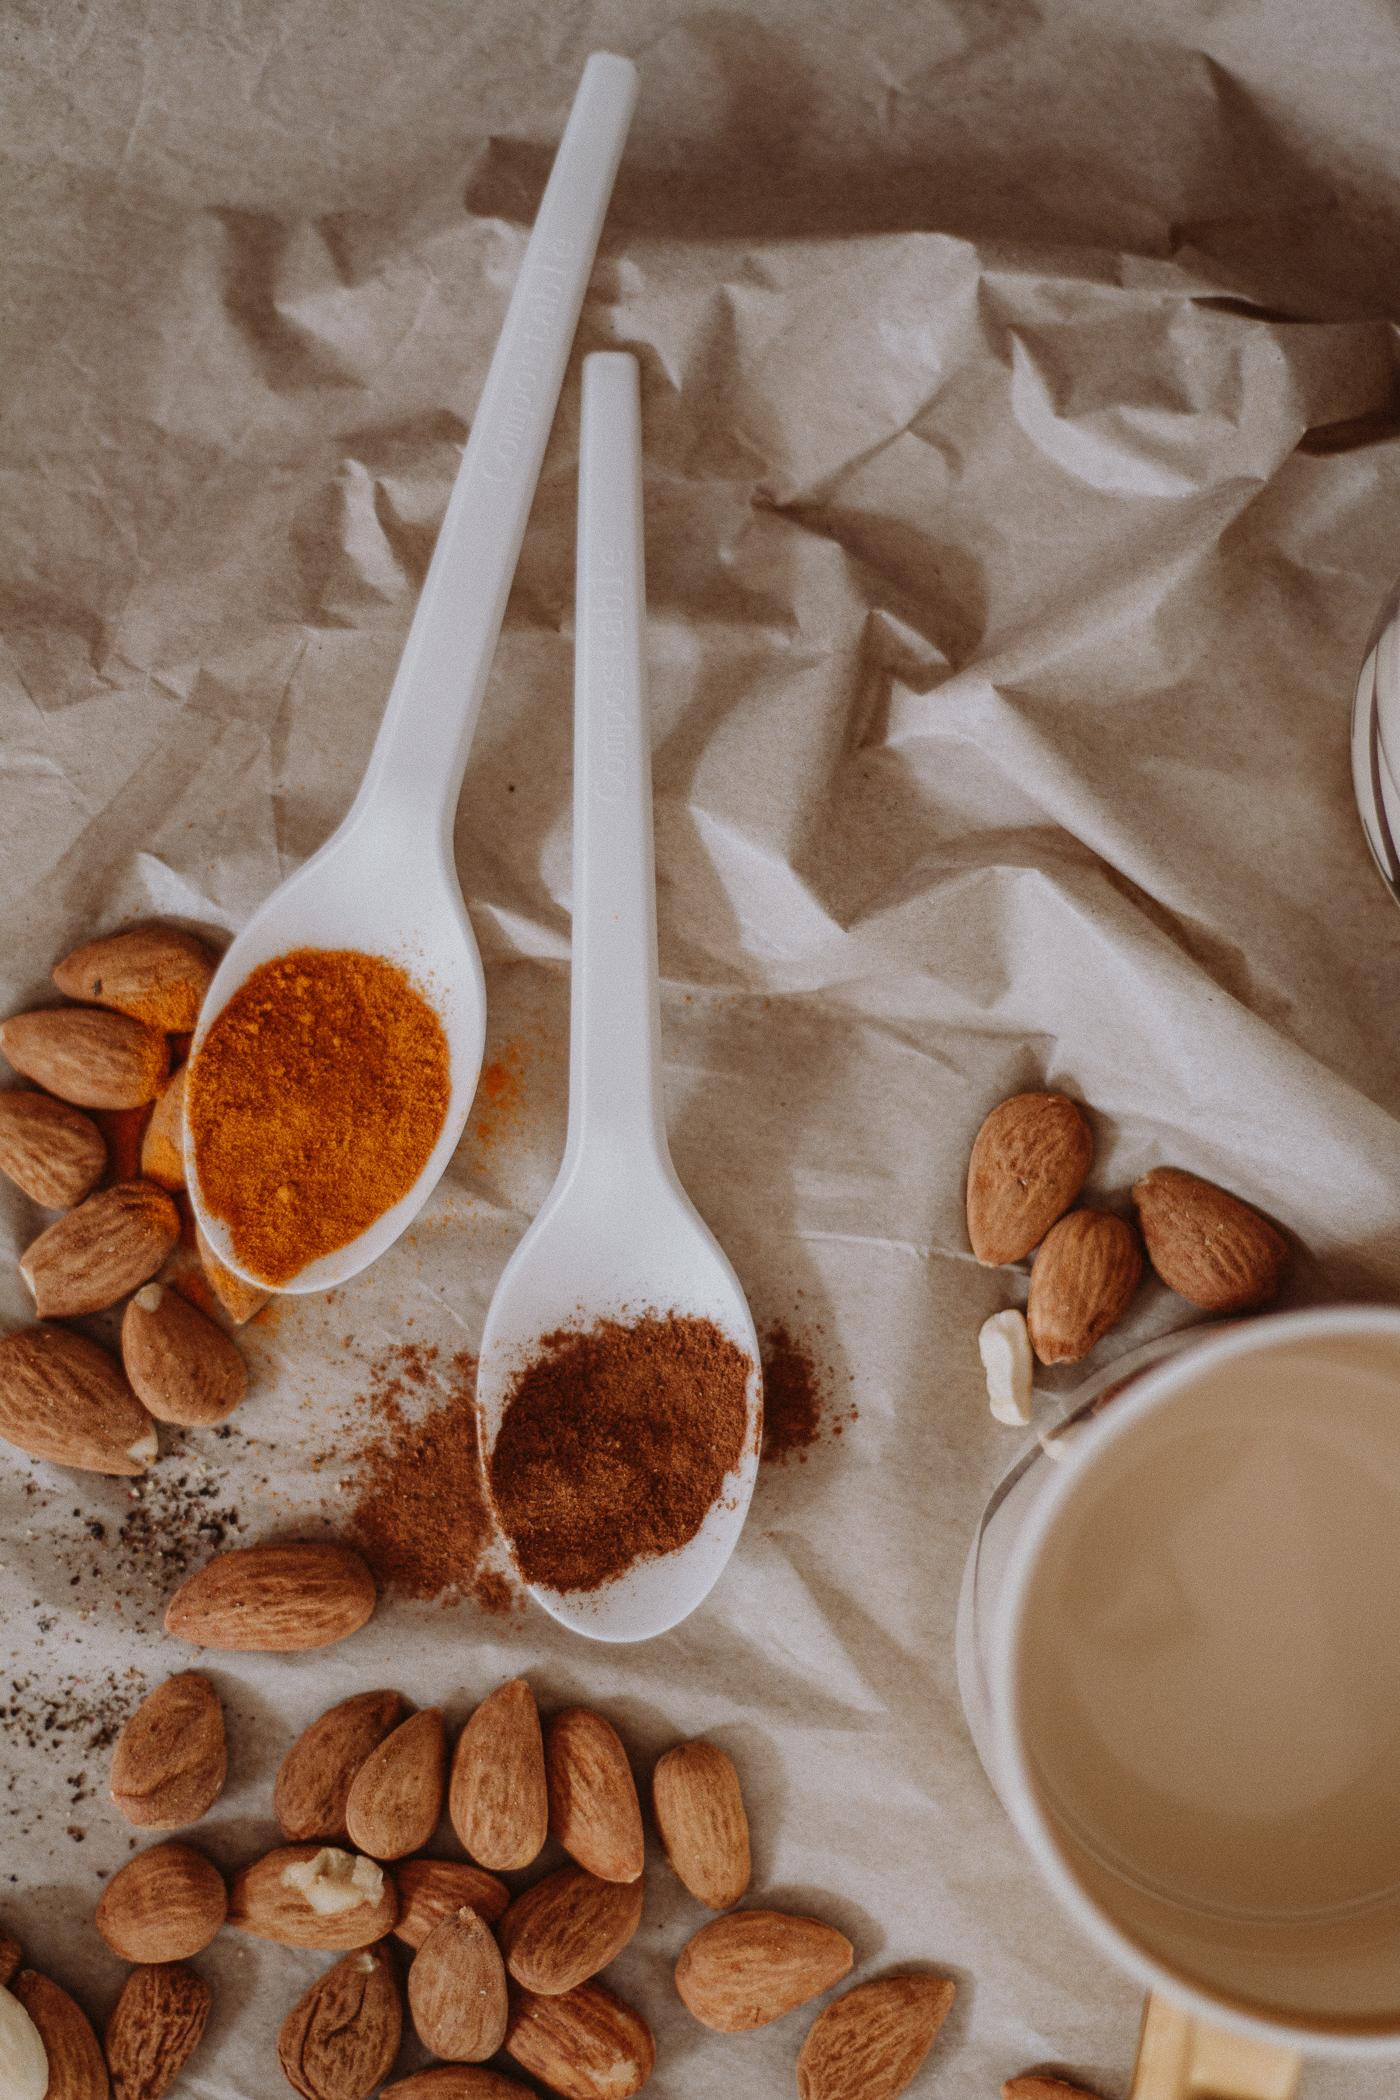 Golden Mylk, Turmeric Latte Recipe | Love Daily Dose